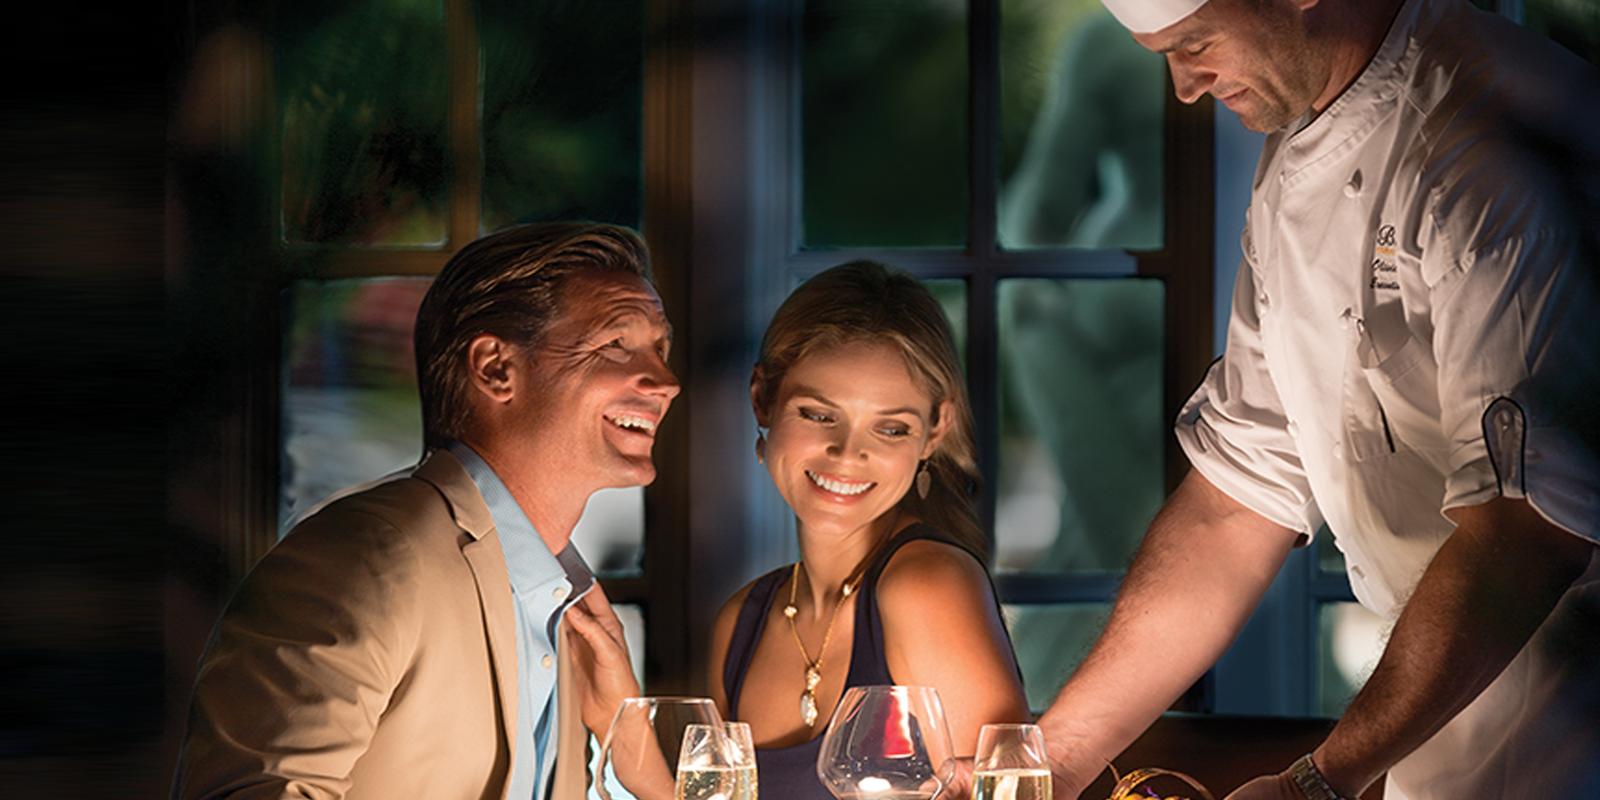 Enjoy fine dining at the Biltmore!